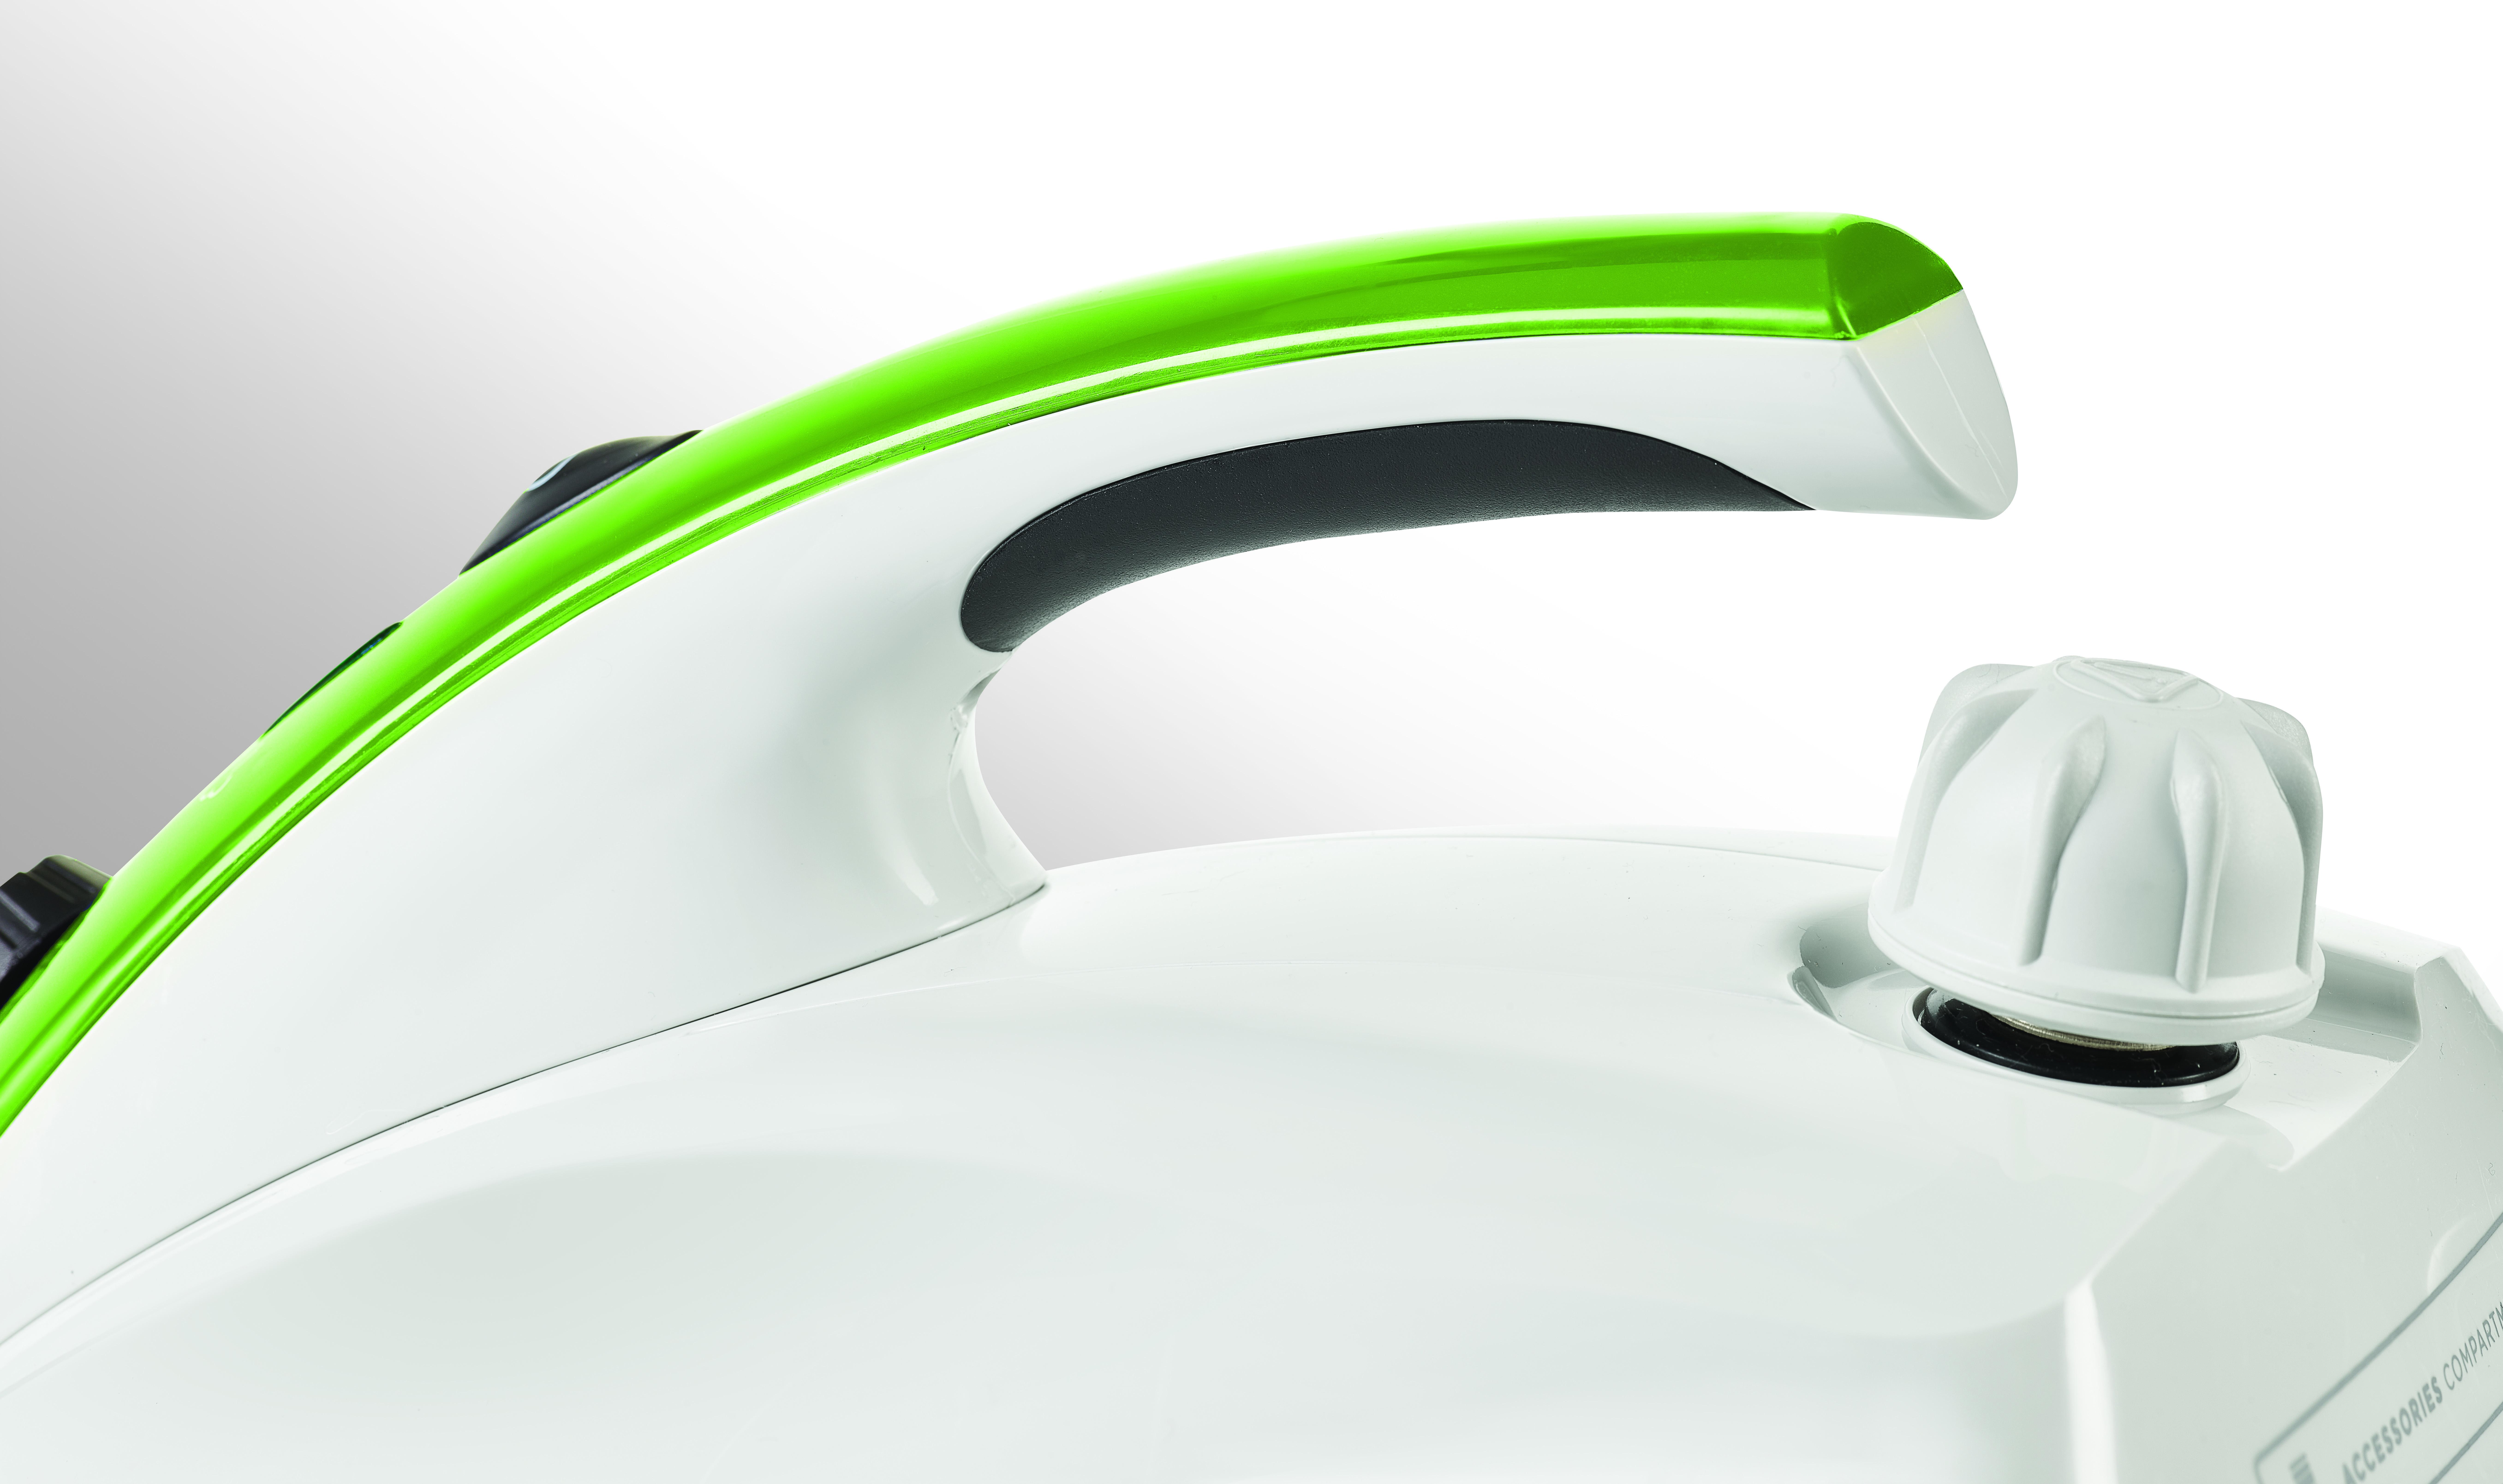 Vaporetto Smart 35_Mop safety cap